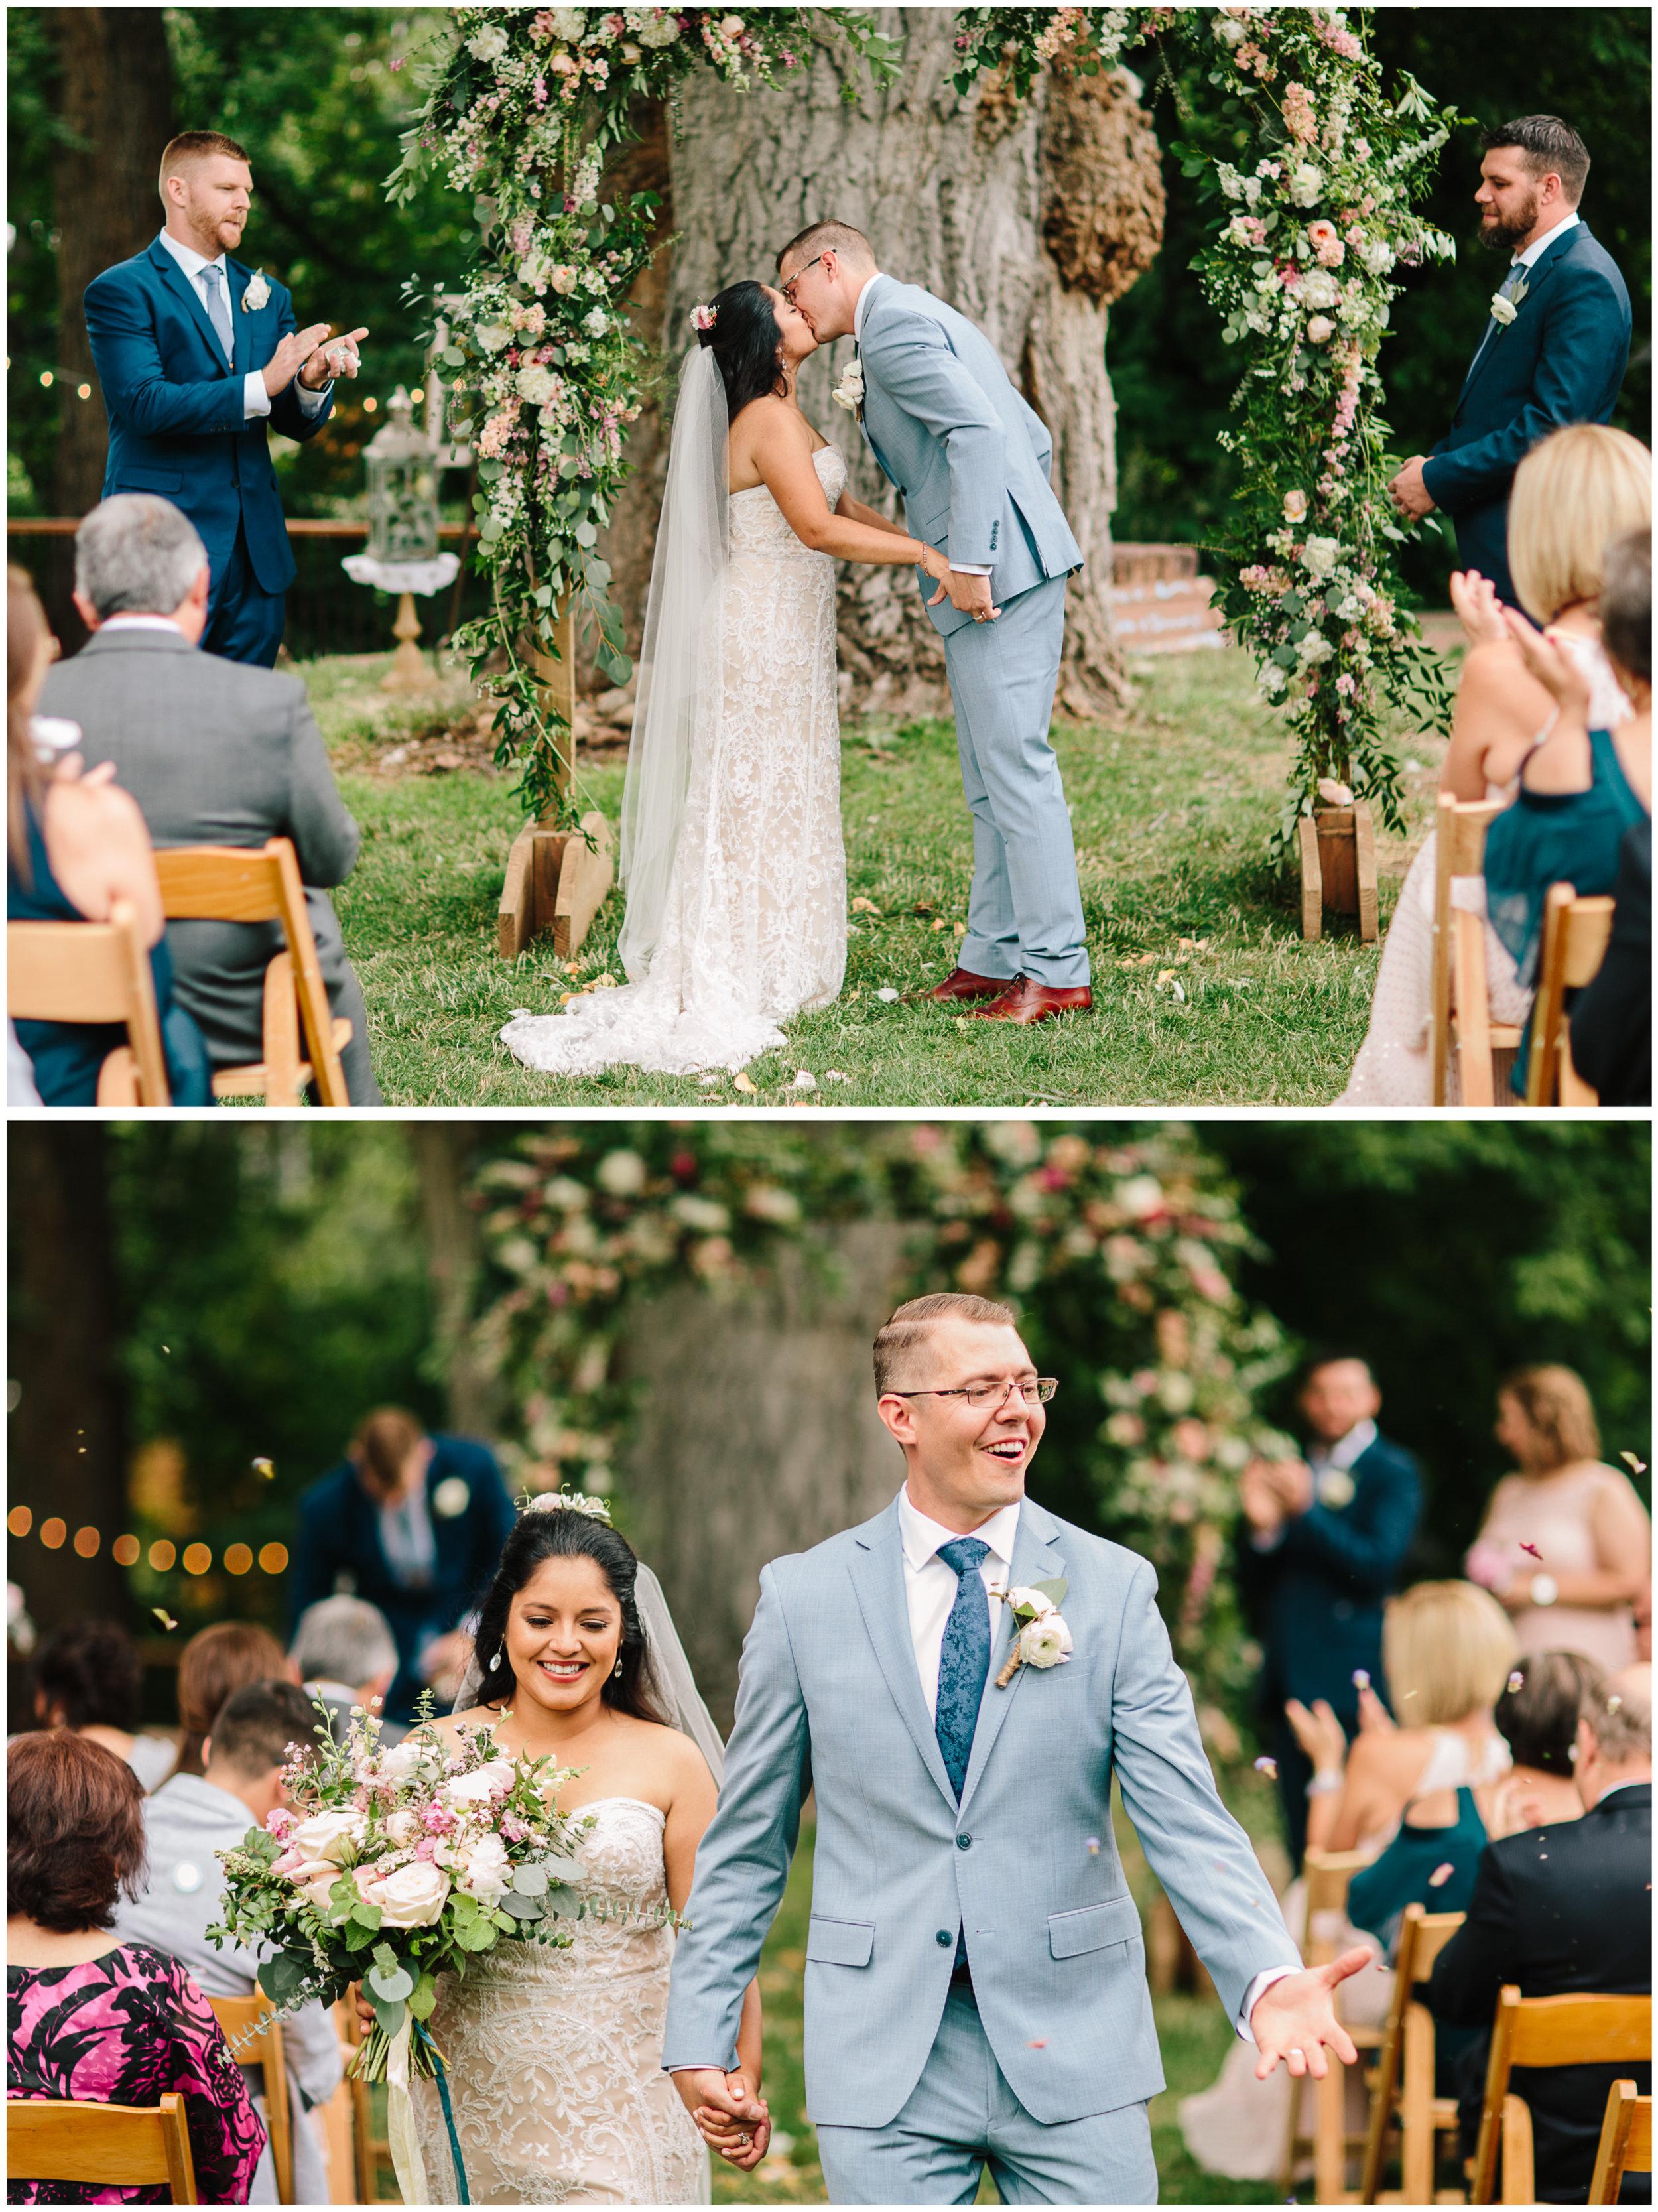 lyons_farmette_wedding_28.jpg